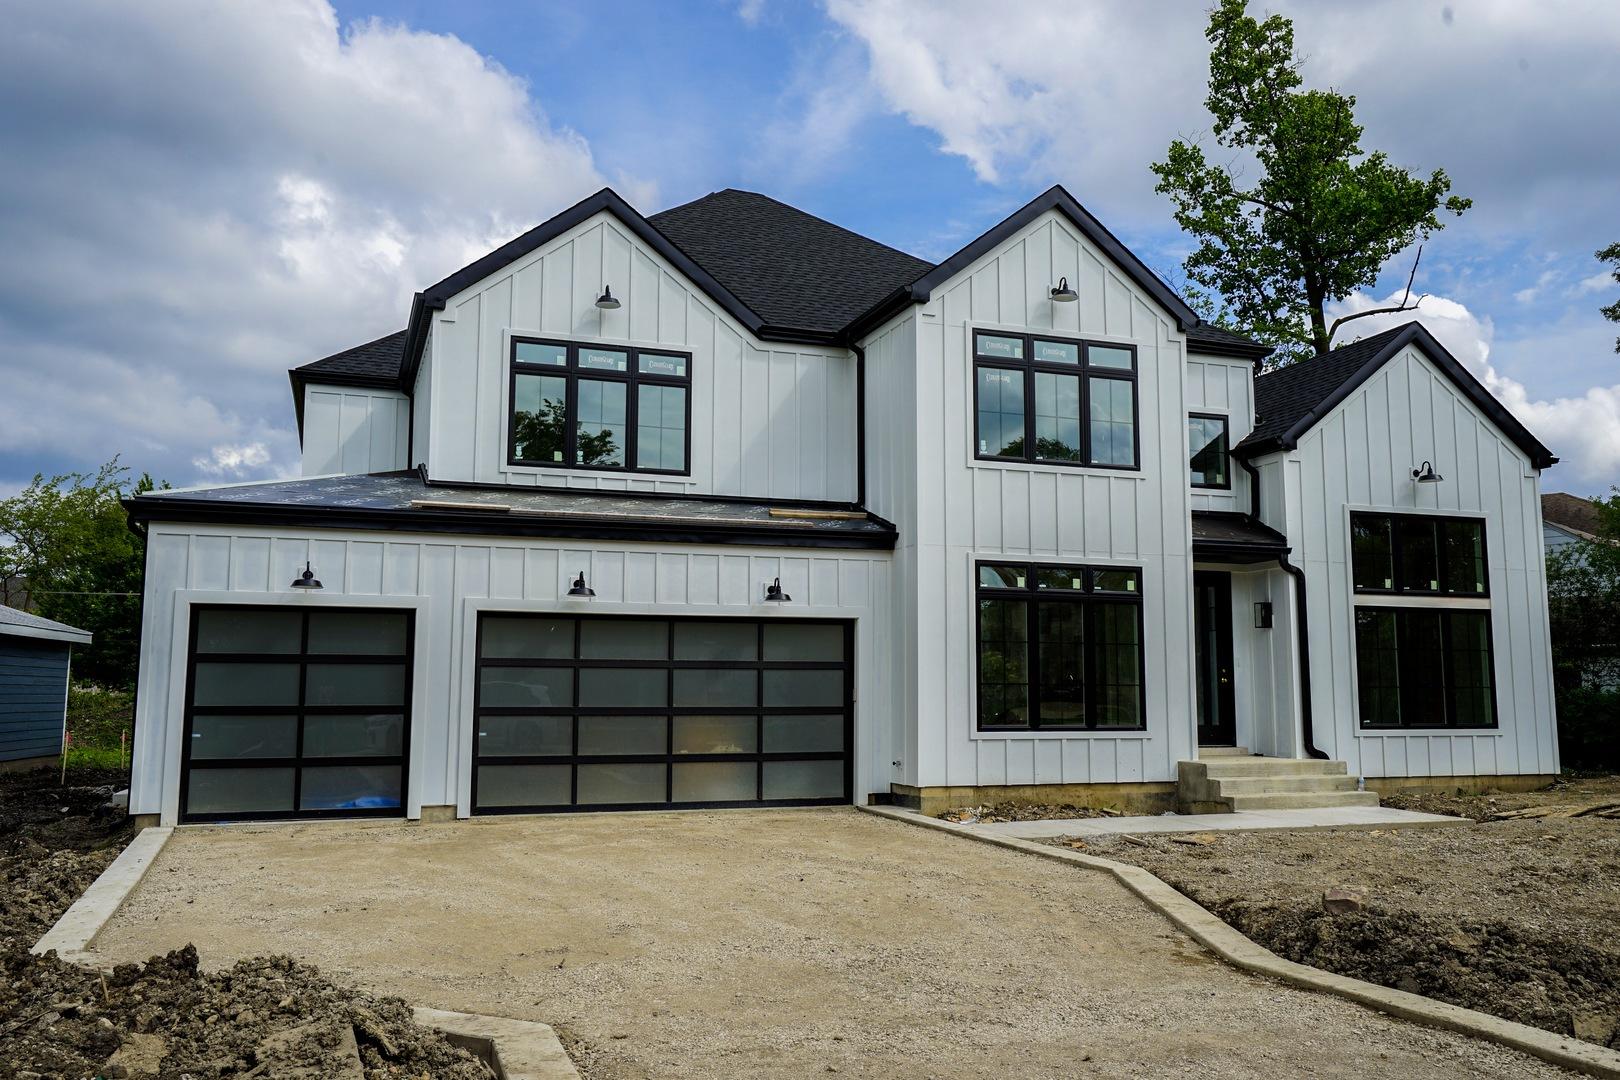 619 Meadow Drive Glenview, IL 60025